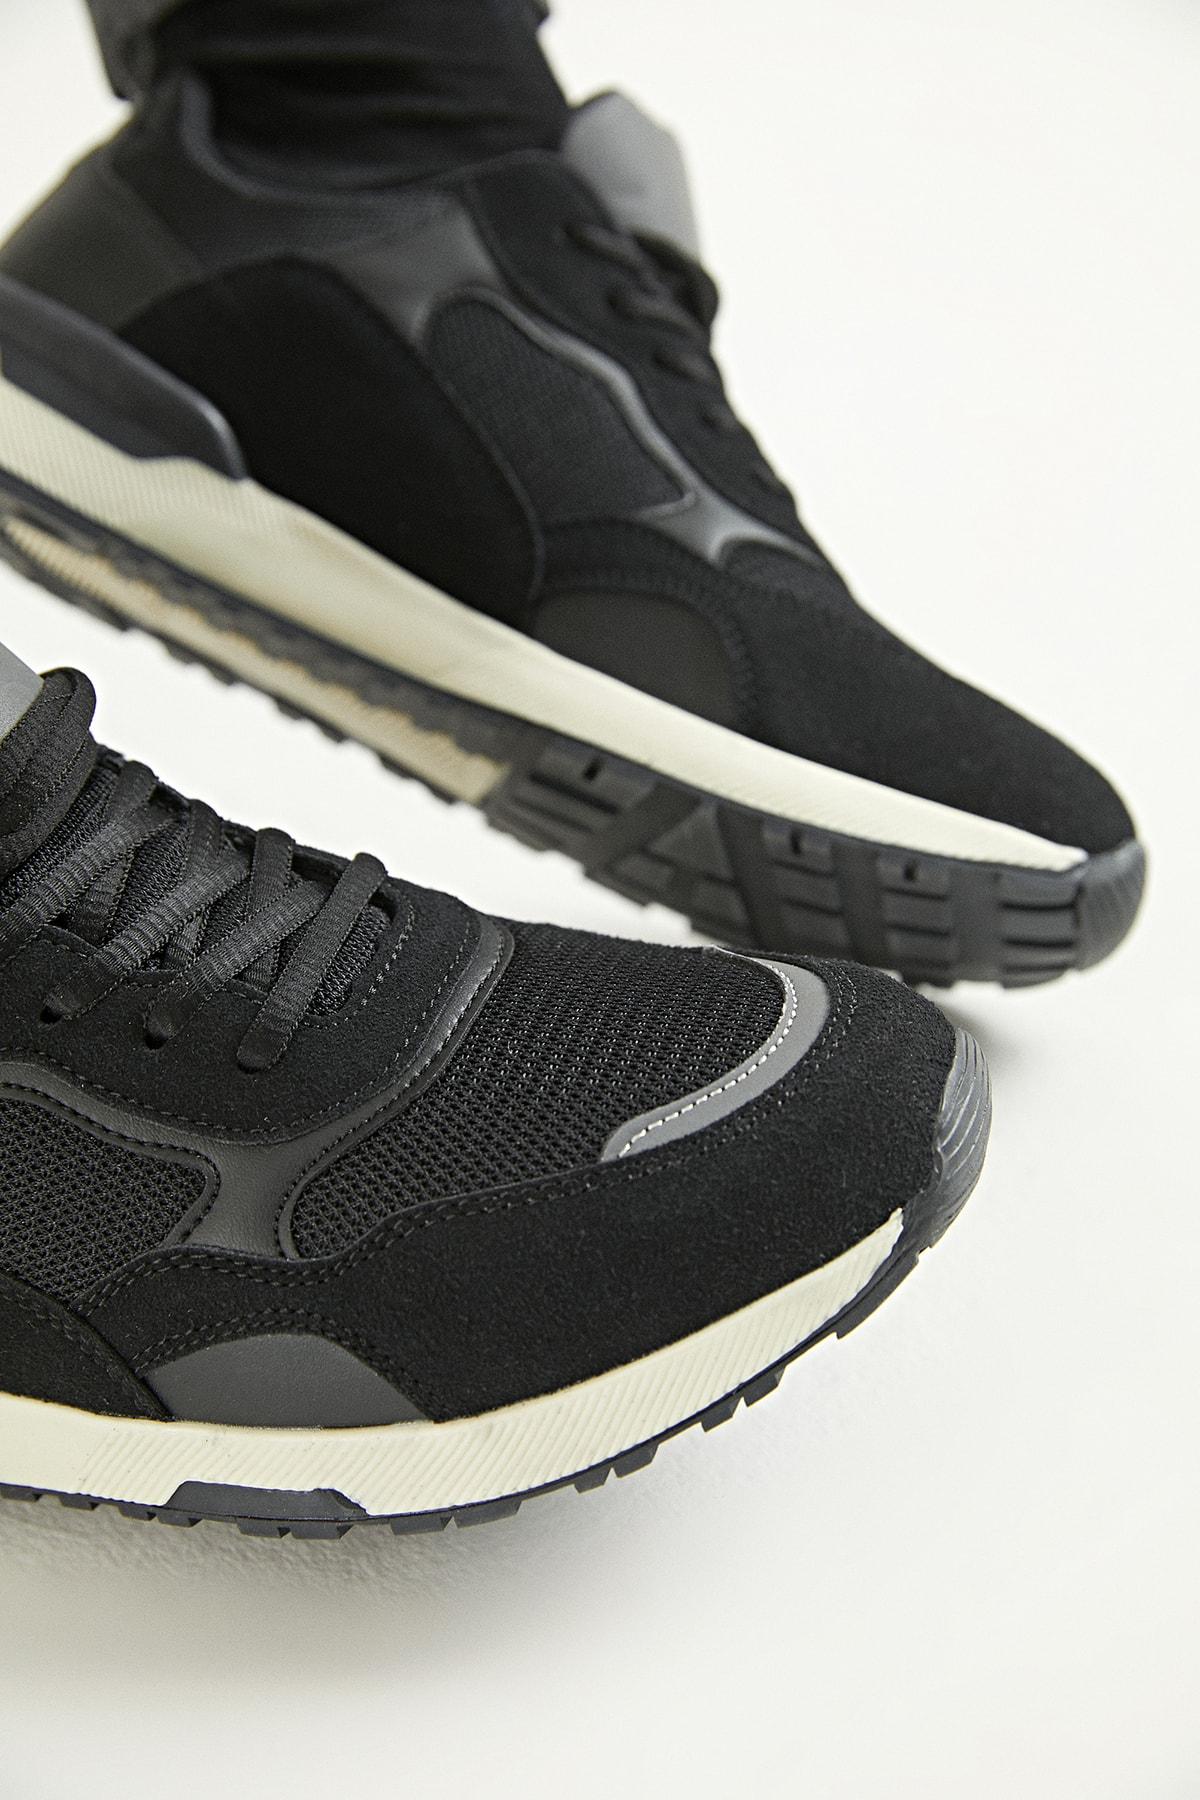 Twn Erkek Ayakkabı Siyah Renk 2